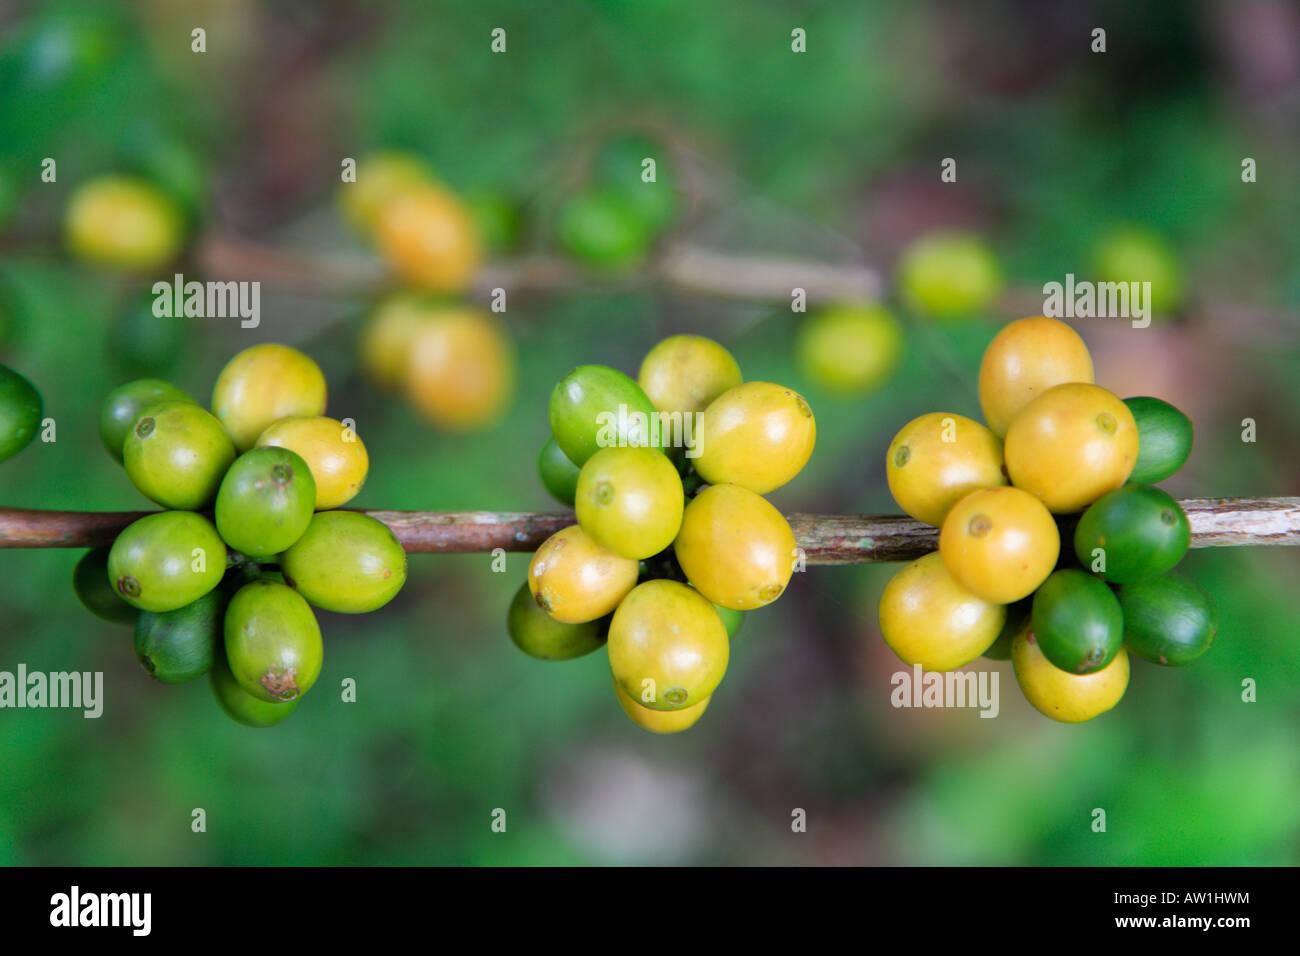 Kaffeebohnen coffee beans Venezuela Stock Photo